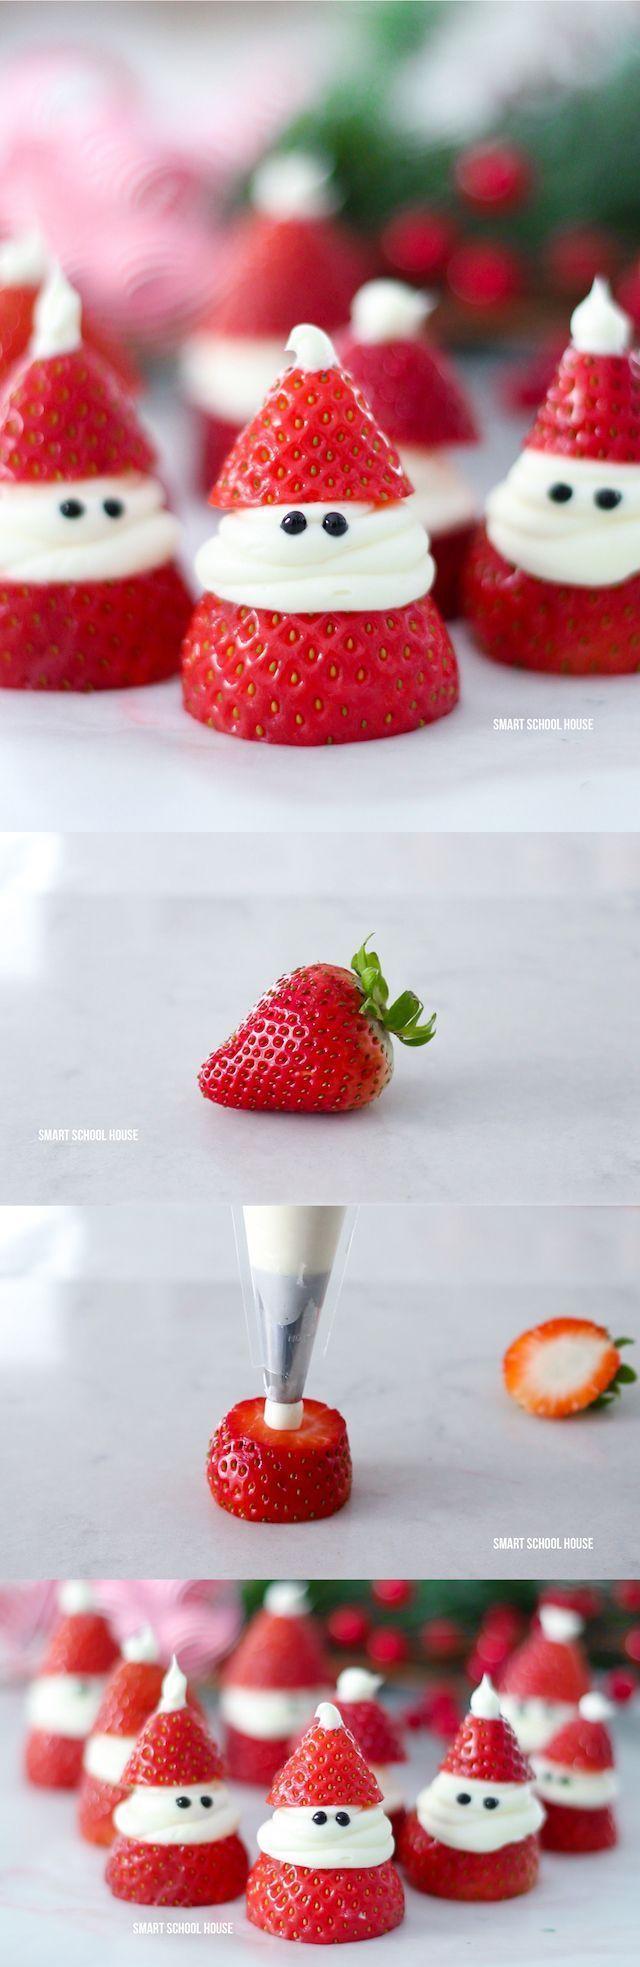 3 Ingredient Strawberry Santas For Christmas ADORABLE